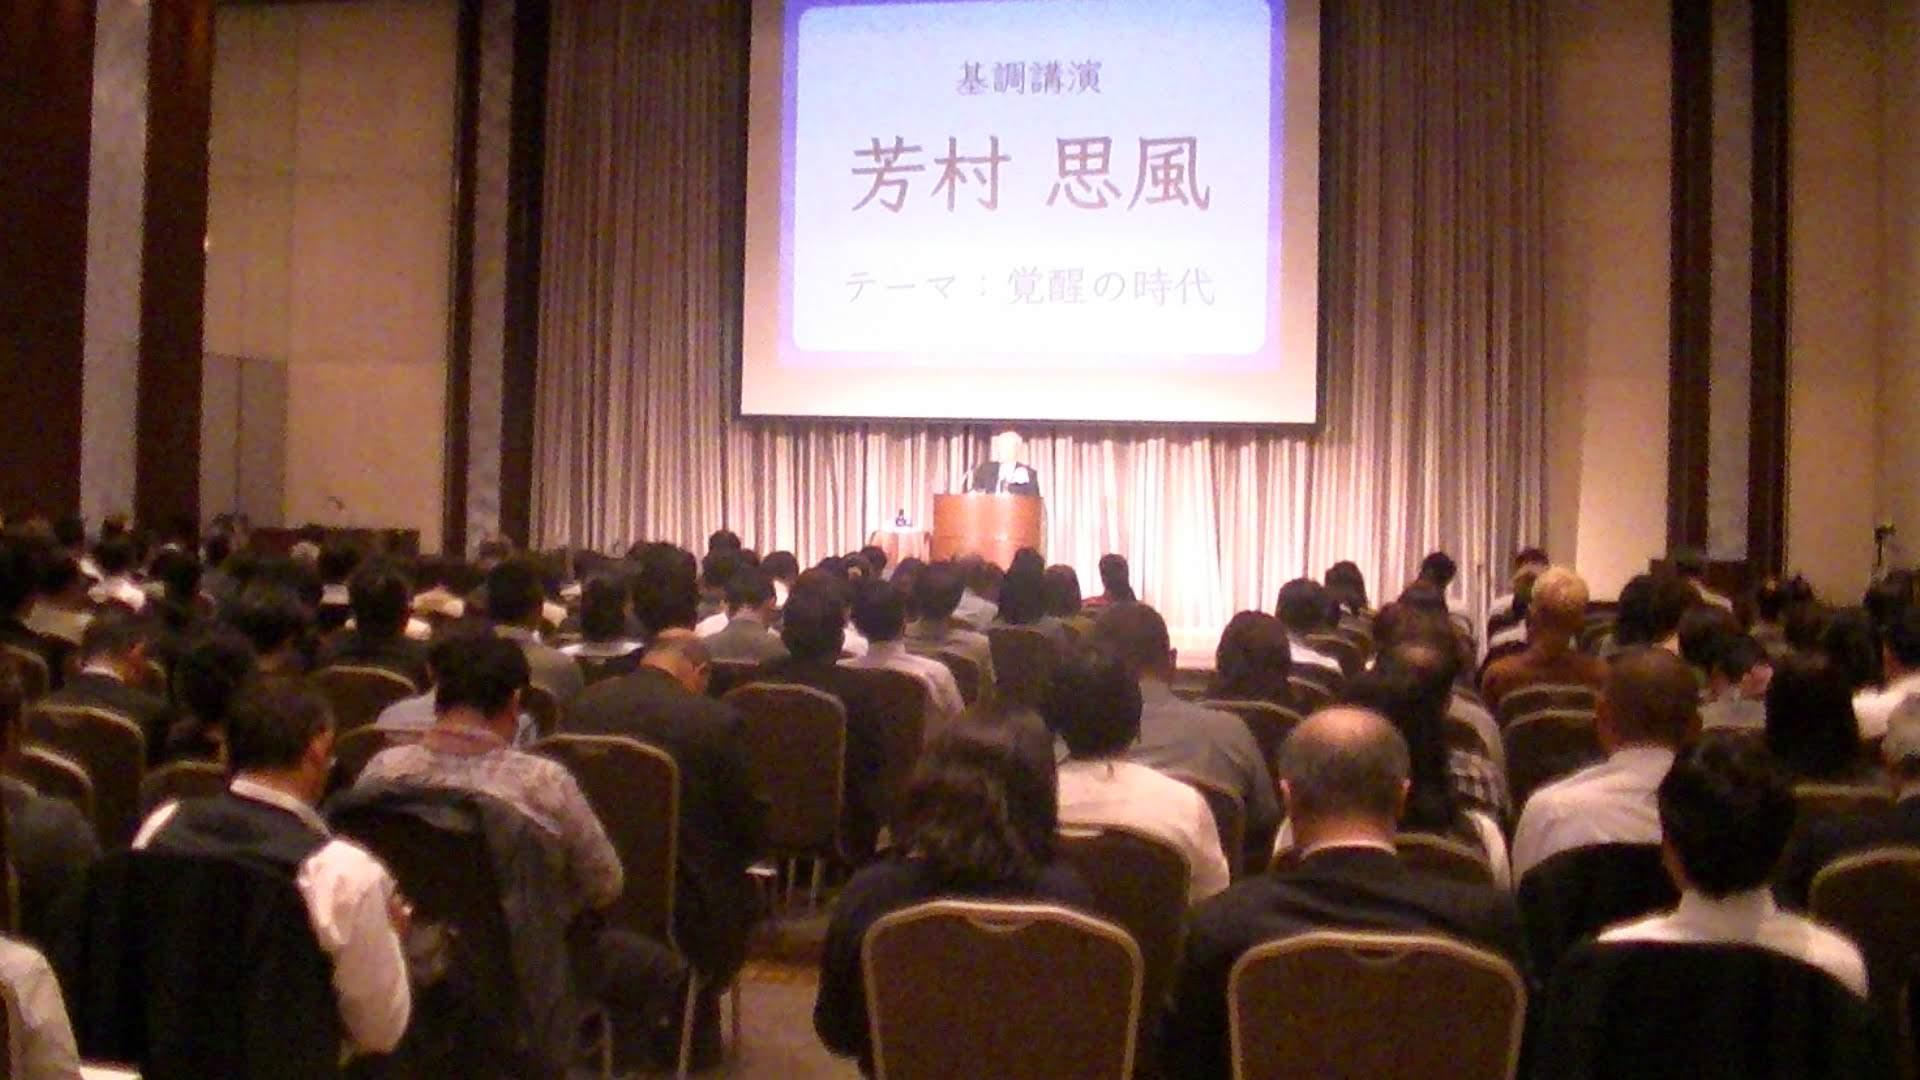 PIC 1718 1 - 思風会全国大会in広島